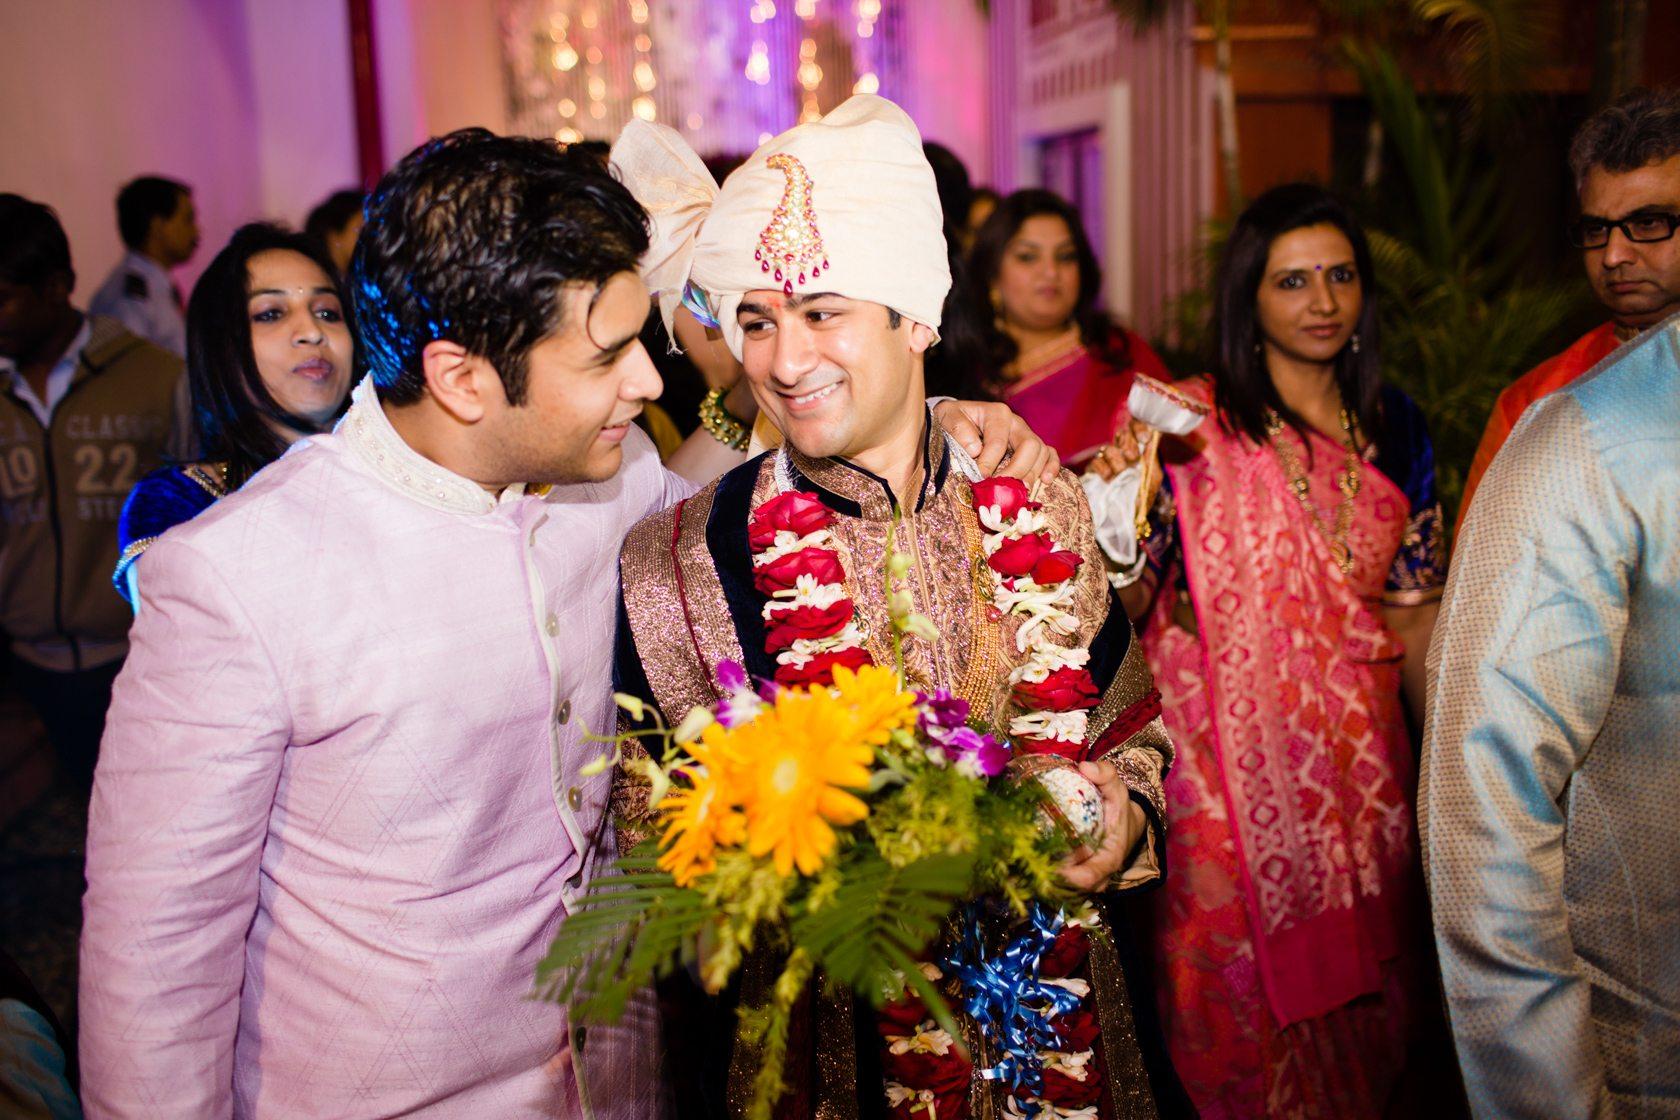 India_Wedding_131.jpg